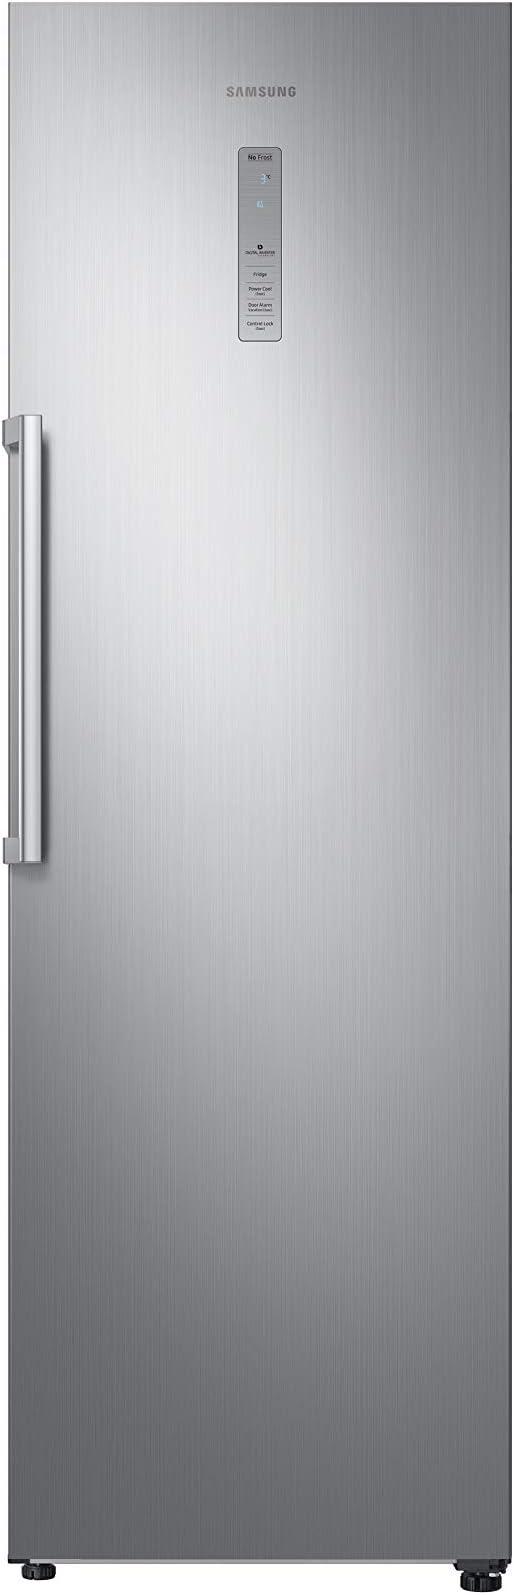 Comprar Frigorífico Twin Inox 185 A++ 385L RR39M7165S9           [Clase de eficiencia energética A++]